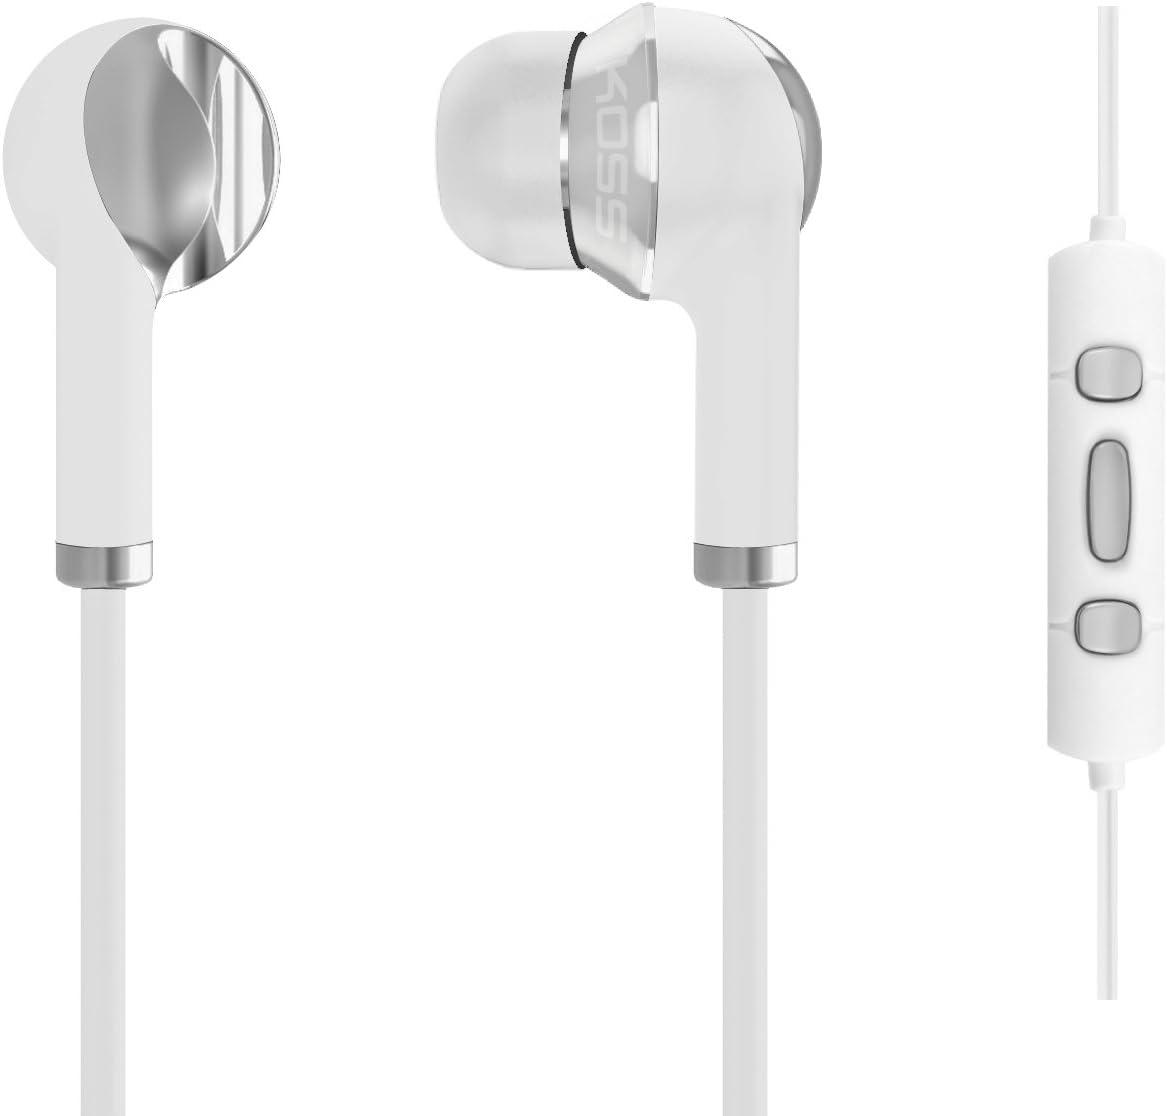 Koss KS181272 KTC - Auricolari per Apple iPhone/iPad/iPod, con microfono, colore: Bianco